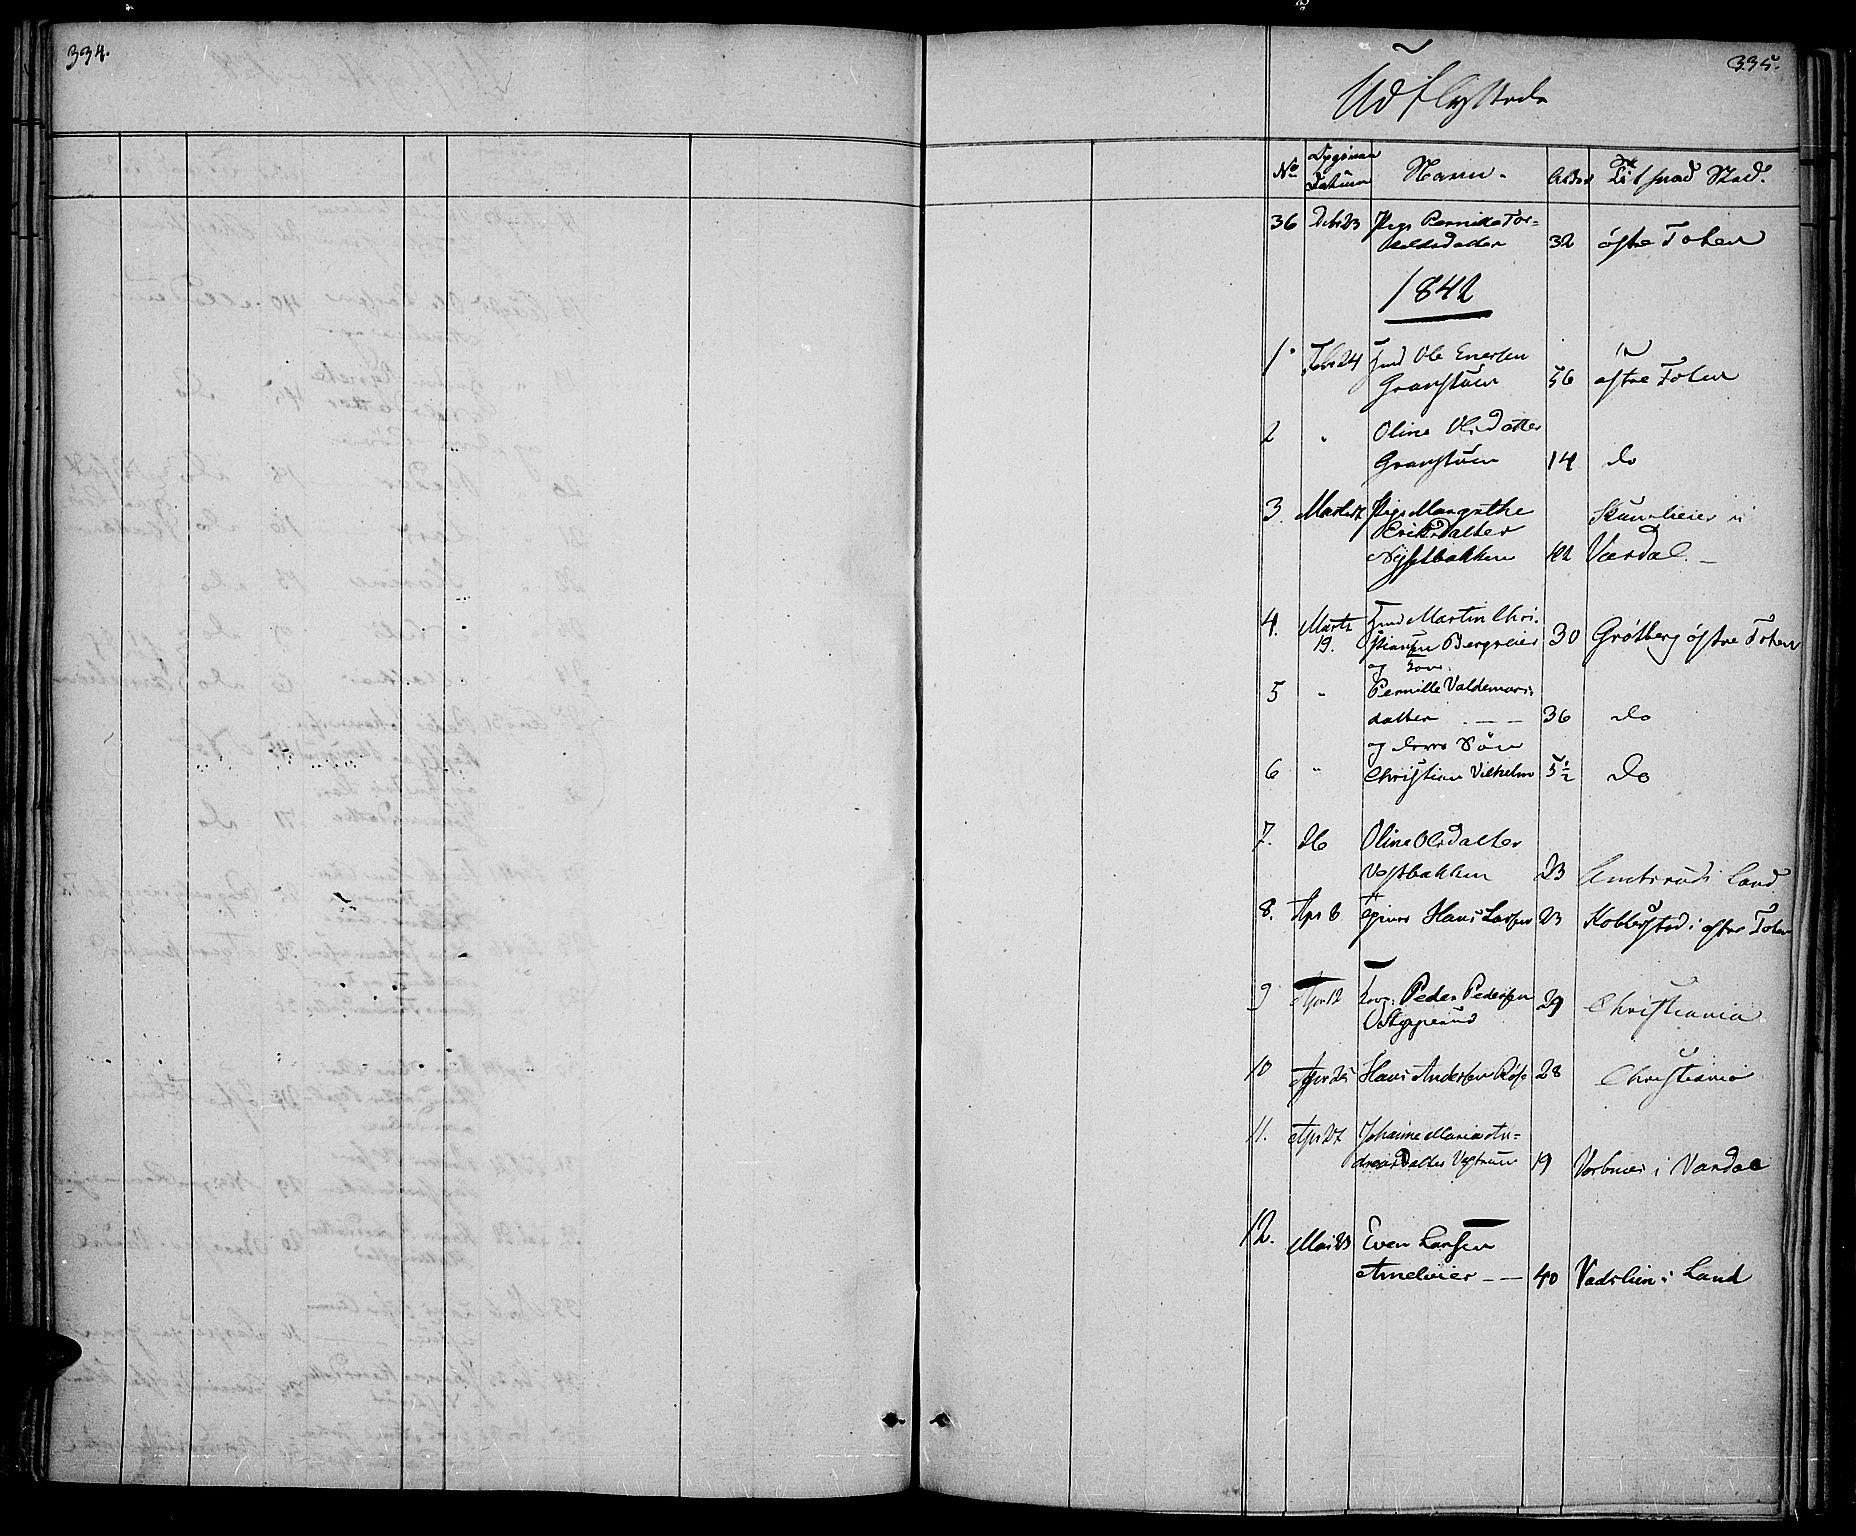 SAH, Vestre Toten prestekontor, H/Ha/Haa/L0003: Ministerialbok nr. 3, 1836-1843, s. 334-335